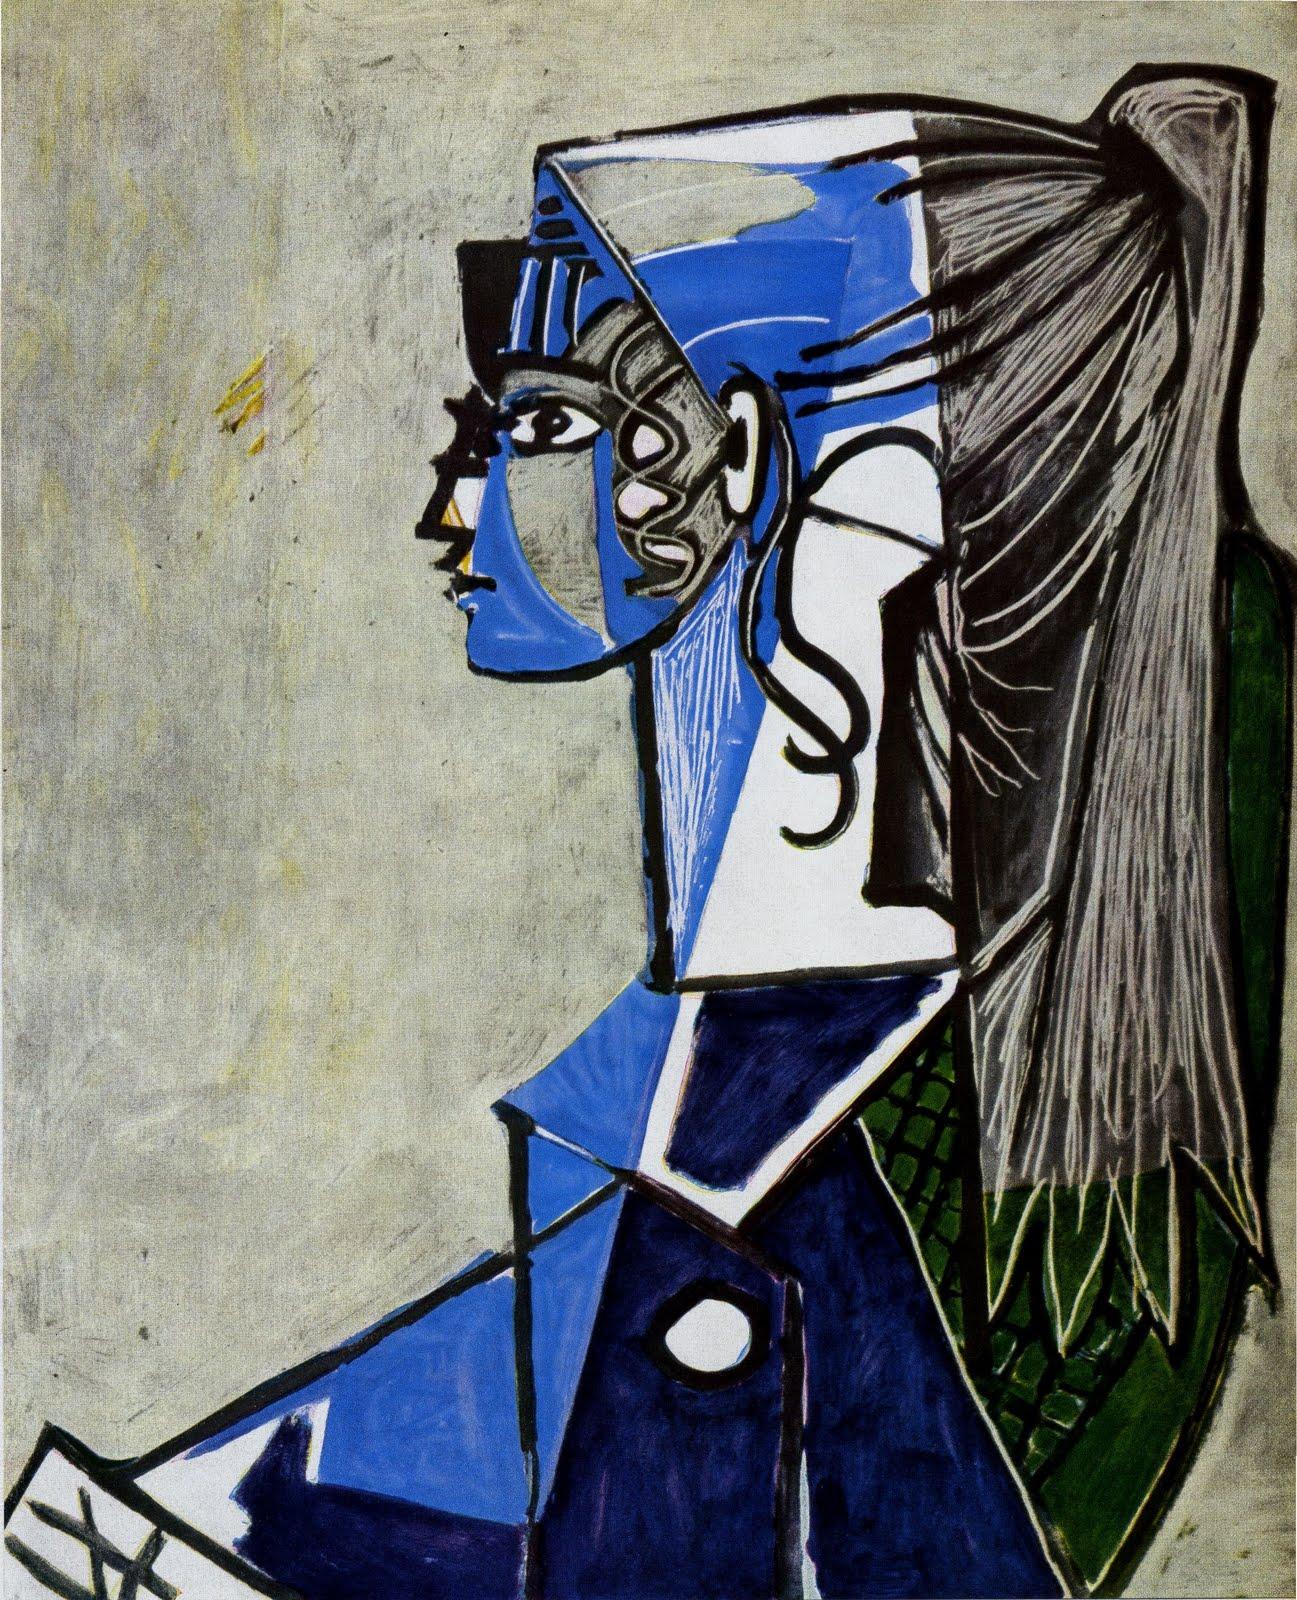 Picasso Hd Tablo Wallpapers Duvar Ka Tlar Kaliteli Resim HD Wallpapers Download Free Images Wallpaper [1000image.com]